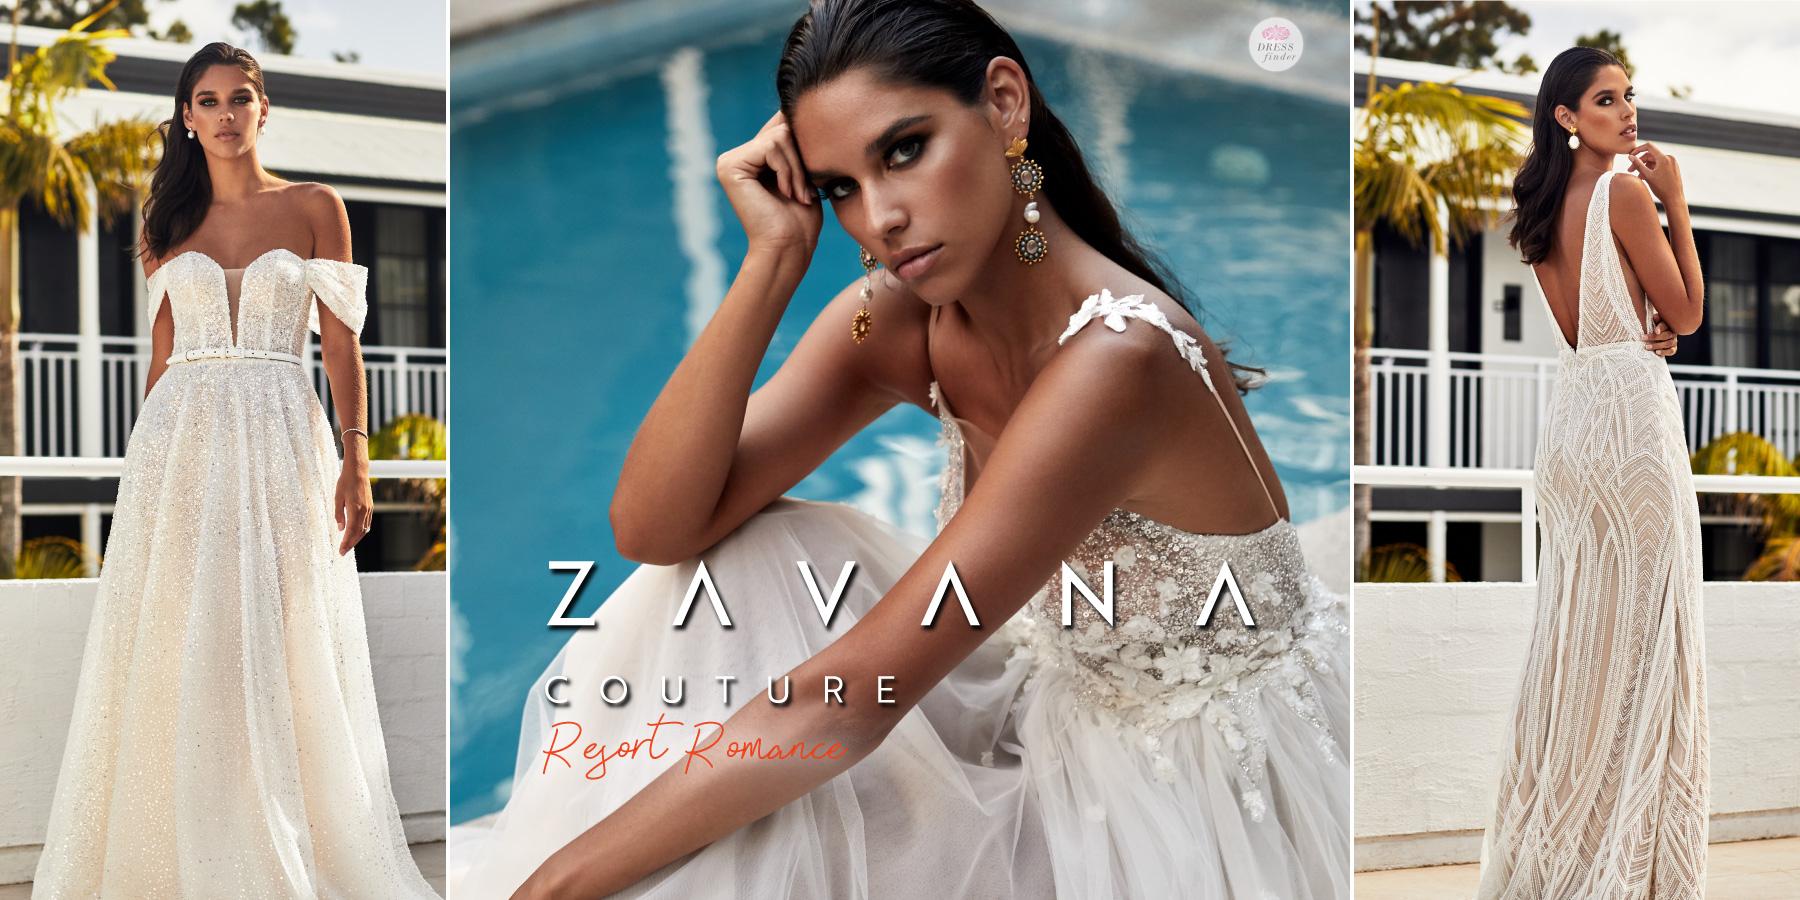 Zavana Couture